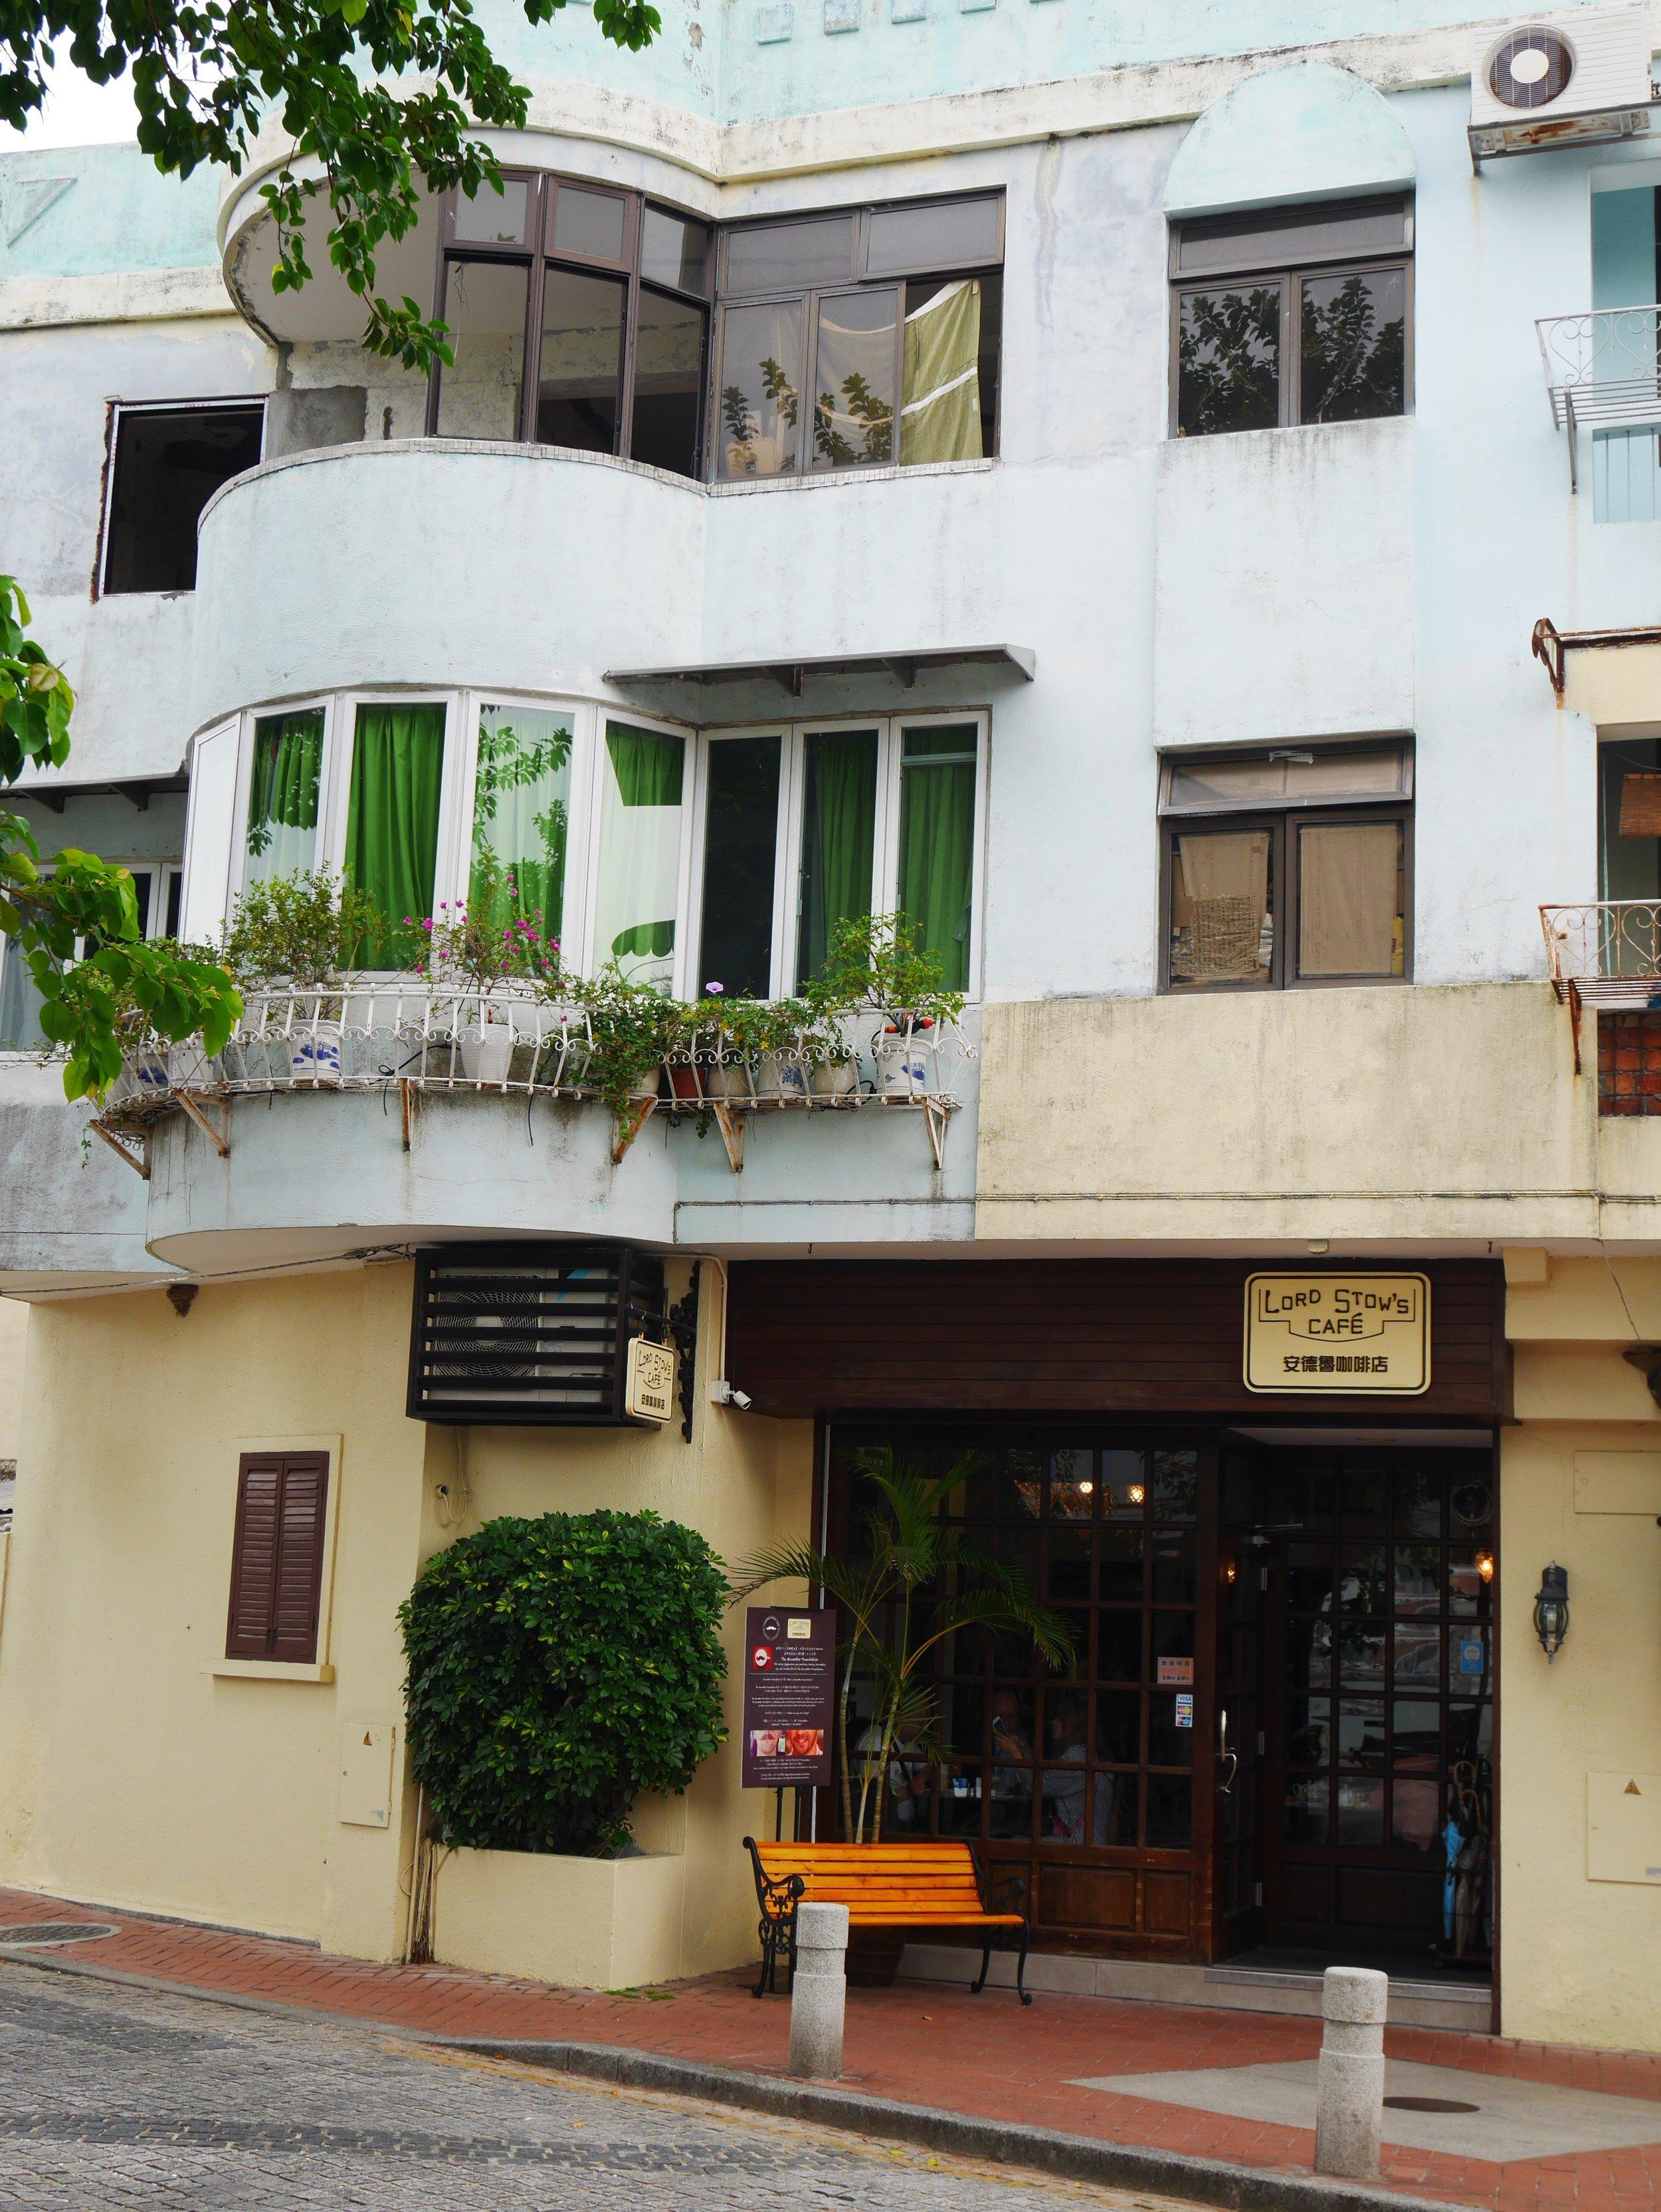 Lord Stow's Cafe, Coloane, Macau